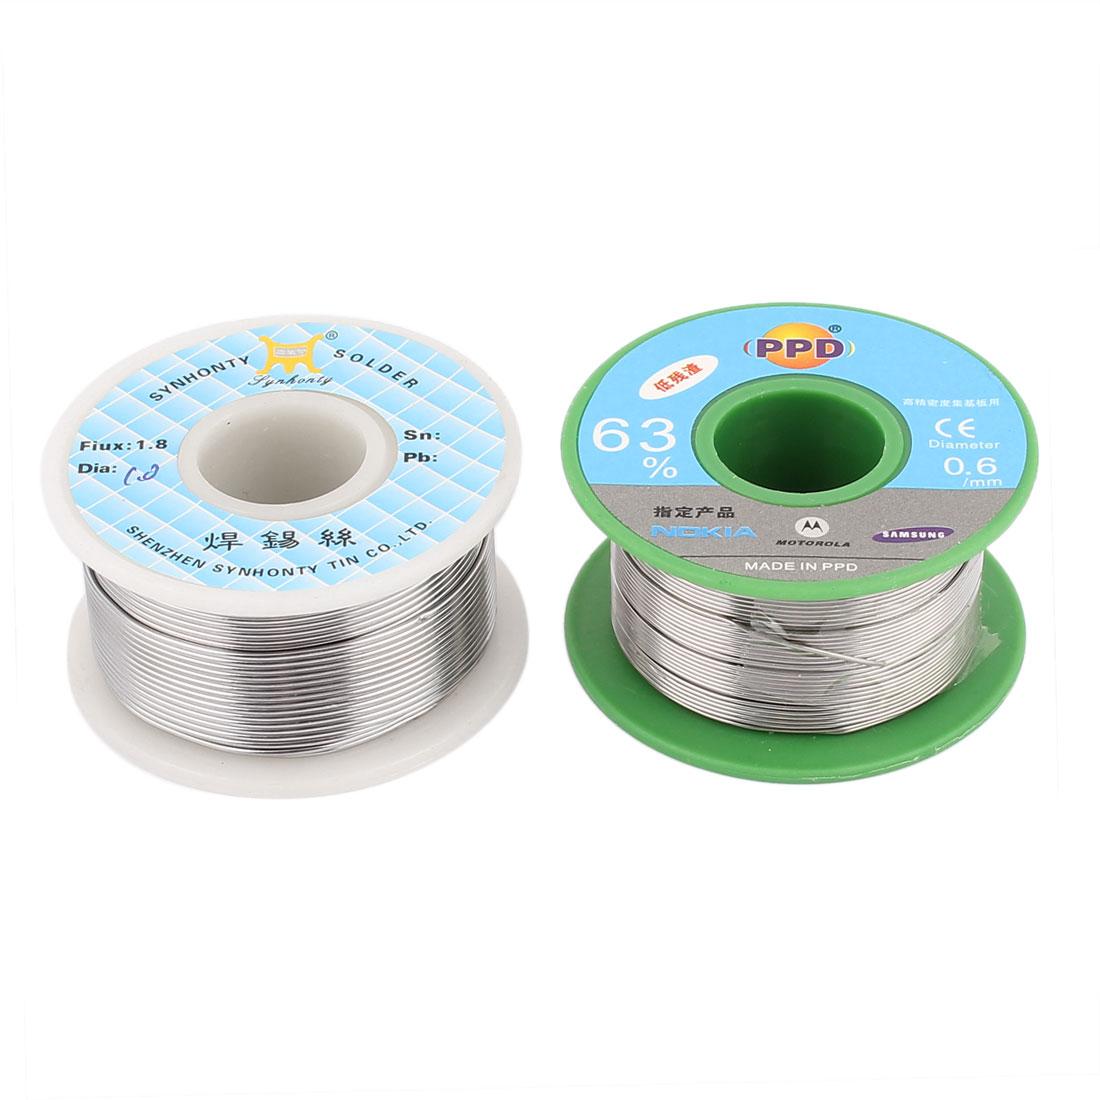 2PCS 0.6mm 1.0mm 63/37 Solder Flux Soldering Tin Lead Wire Reel Core 5M